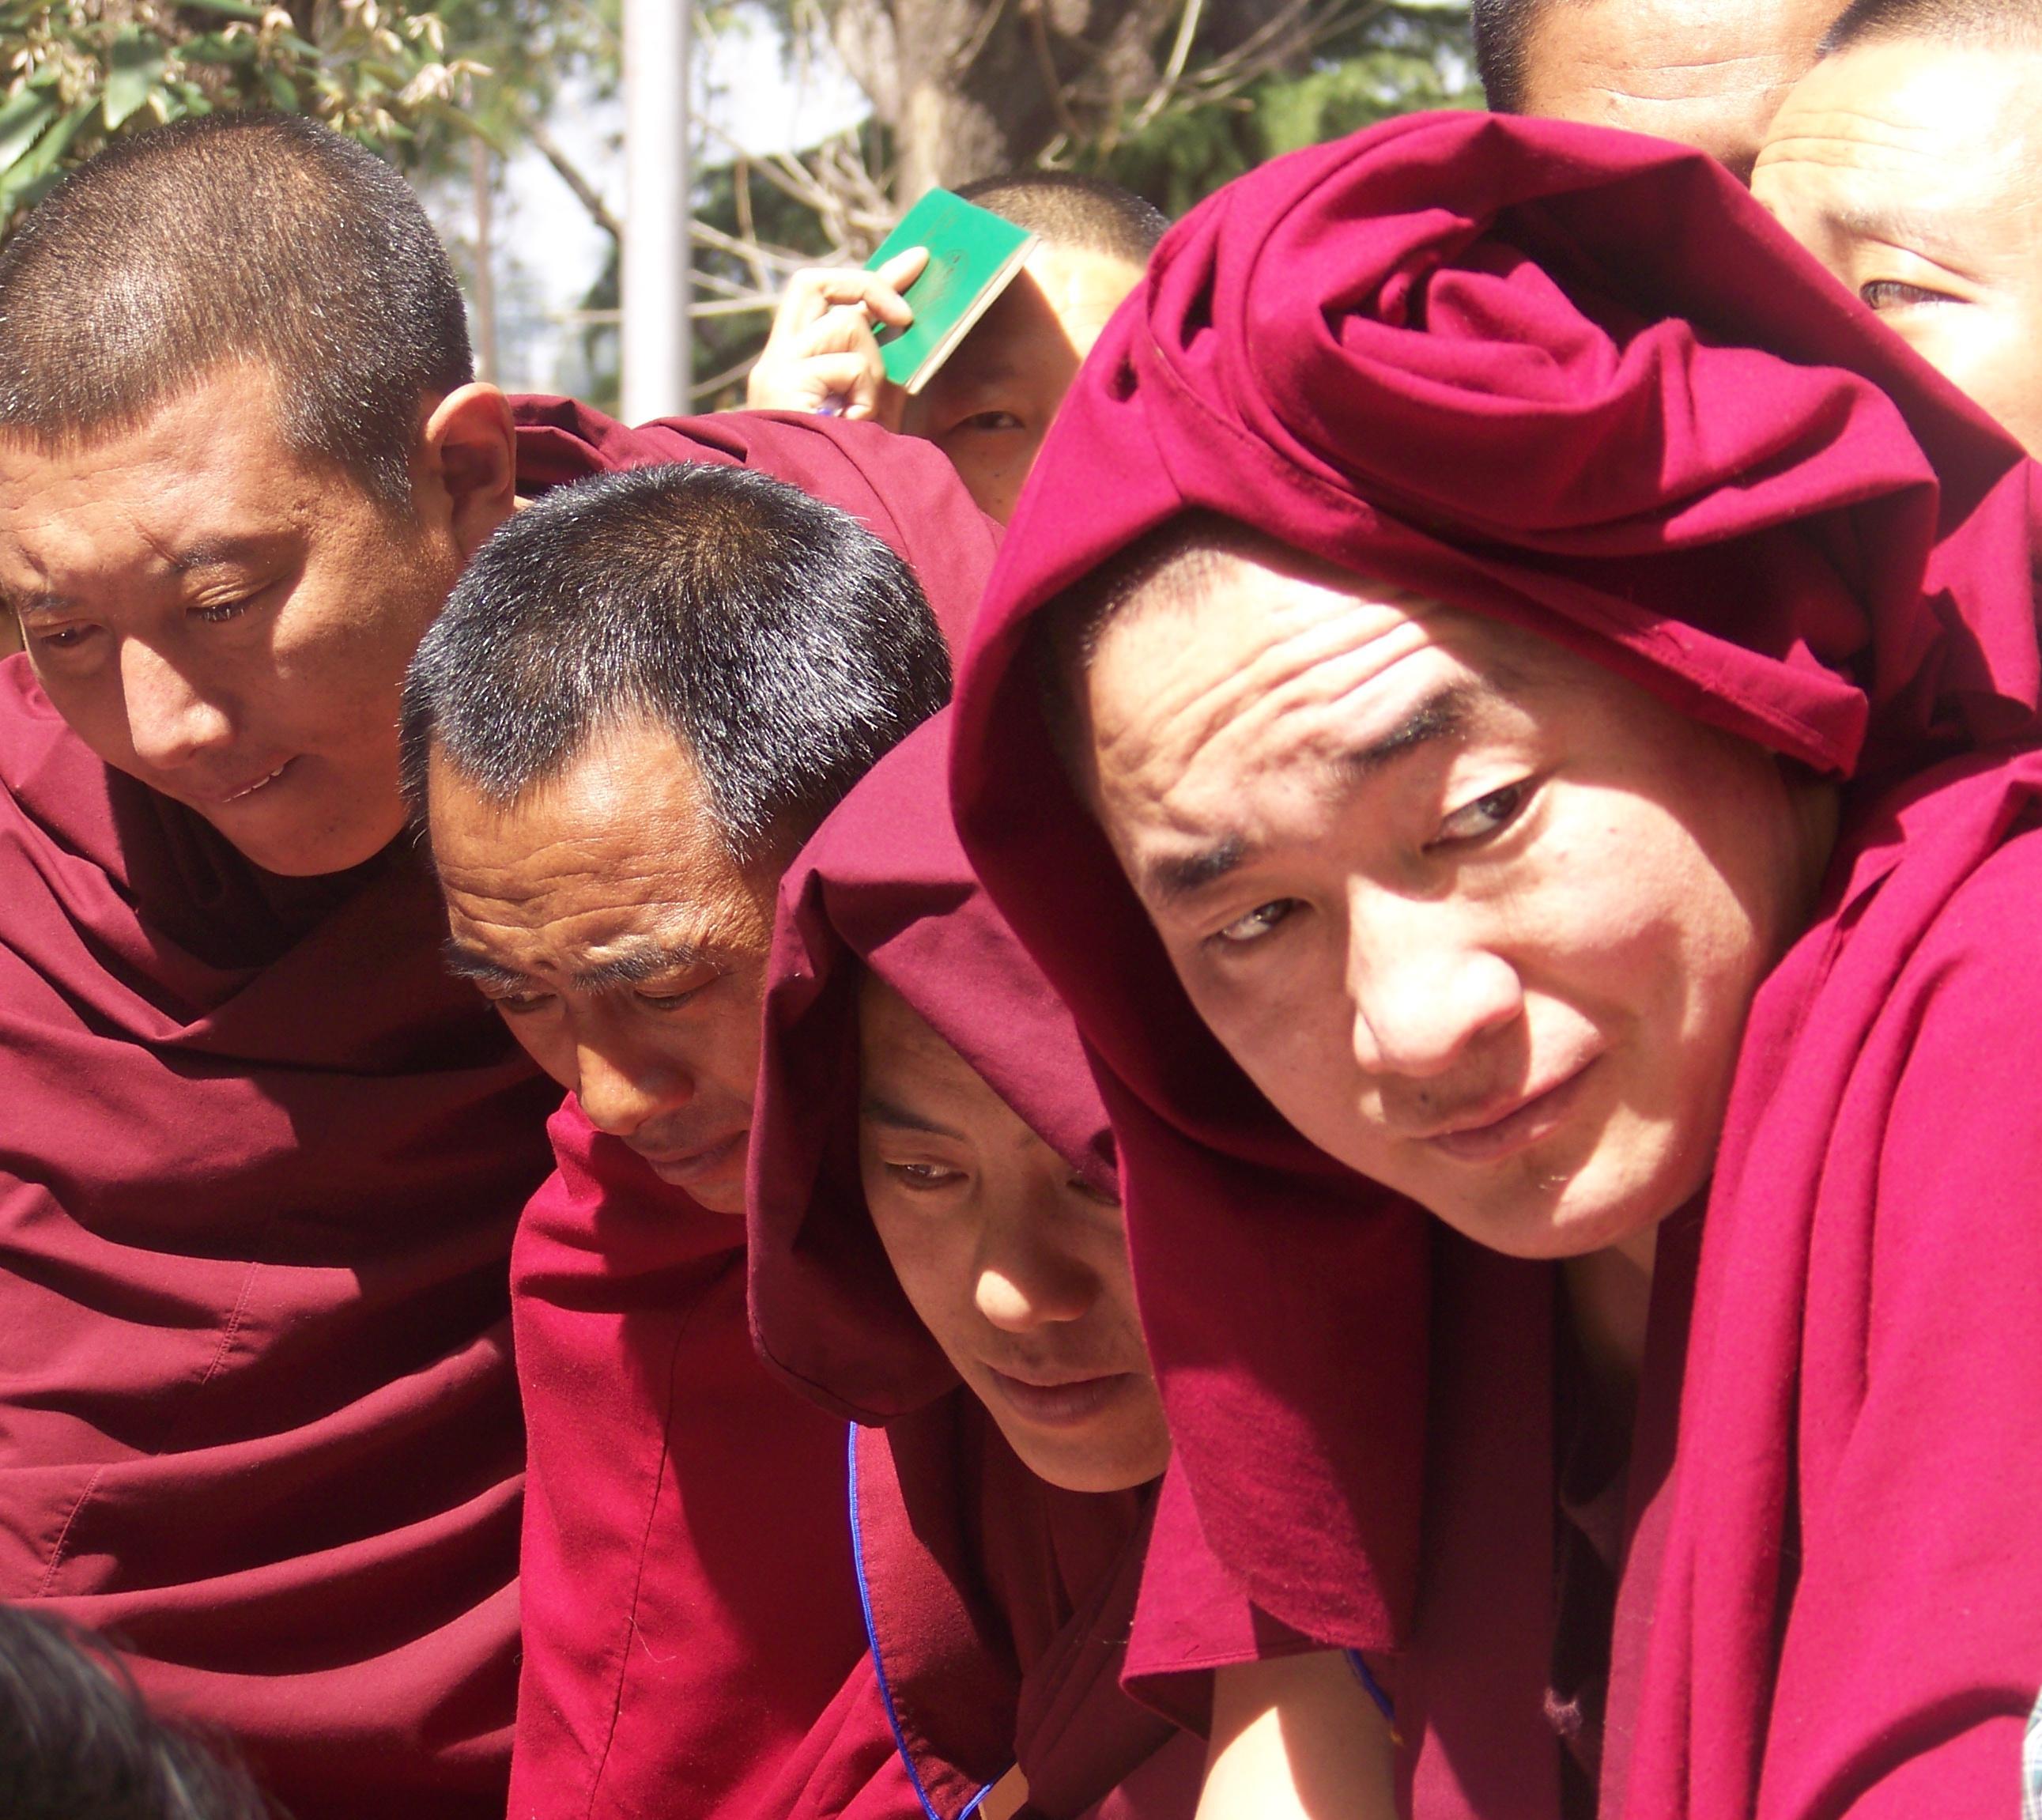 102_2358 Jonathan Machler, Tibétains à Dharamsala, Copyright